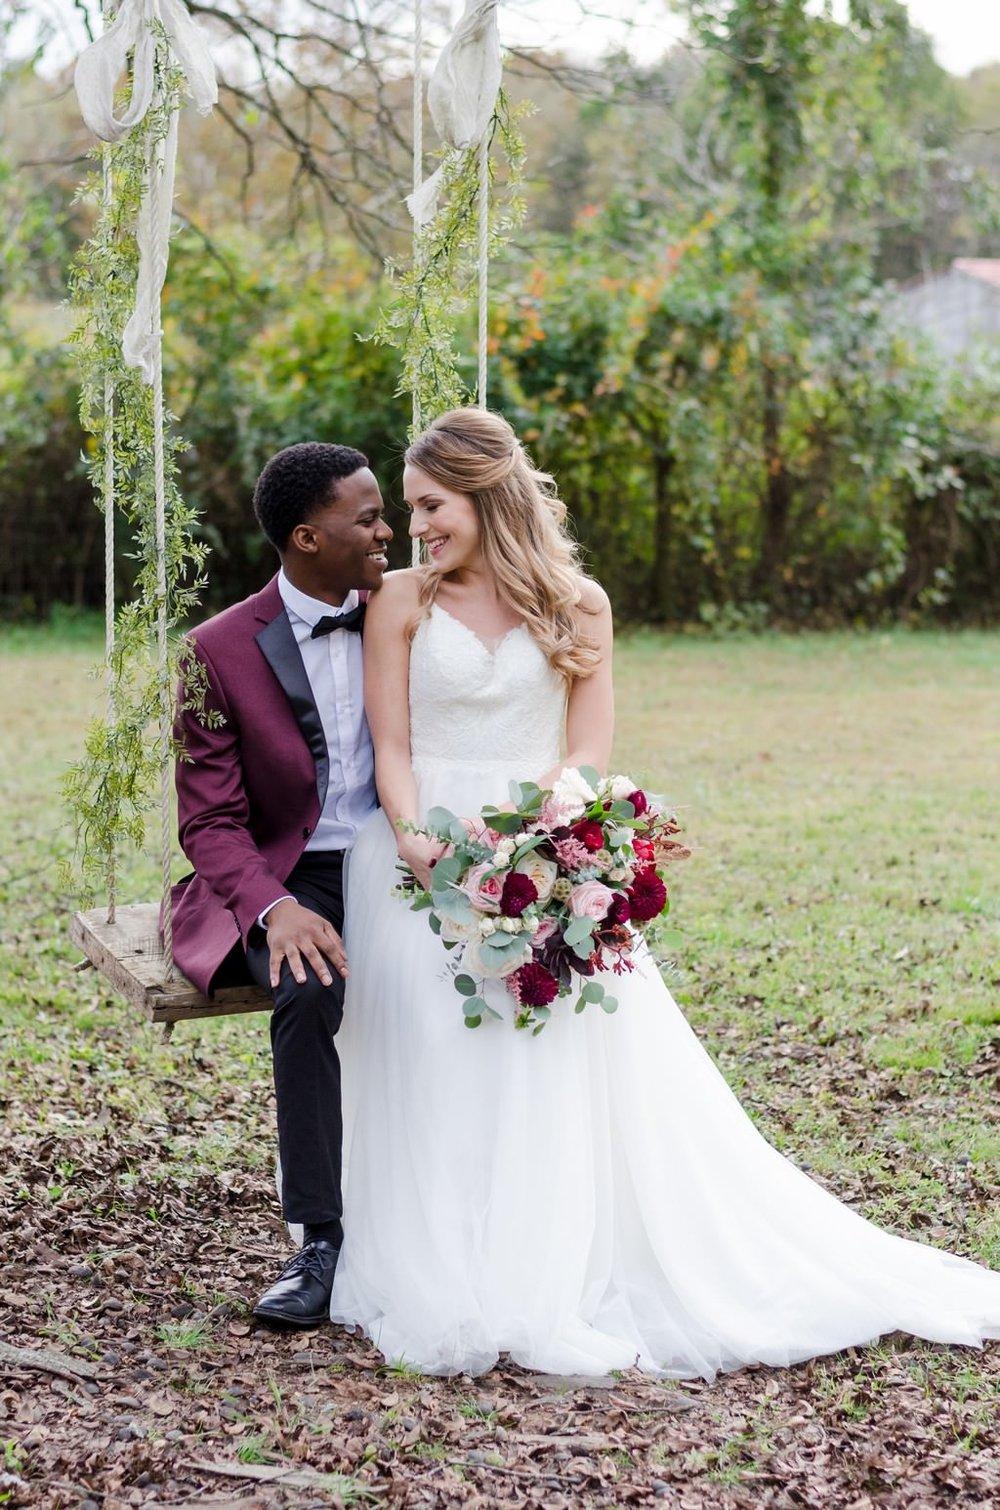 Iriswoods-Mt-Juliet-Blush-and-Burgundy-Nashville-Wedding-Photographer+3